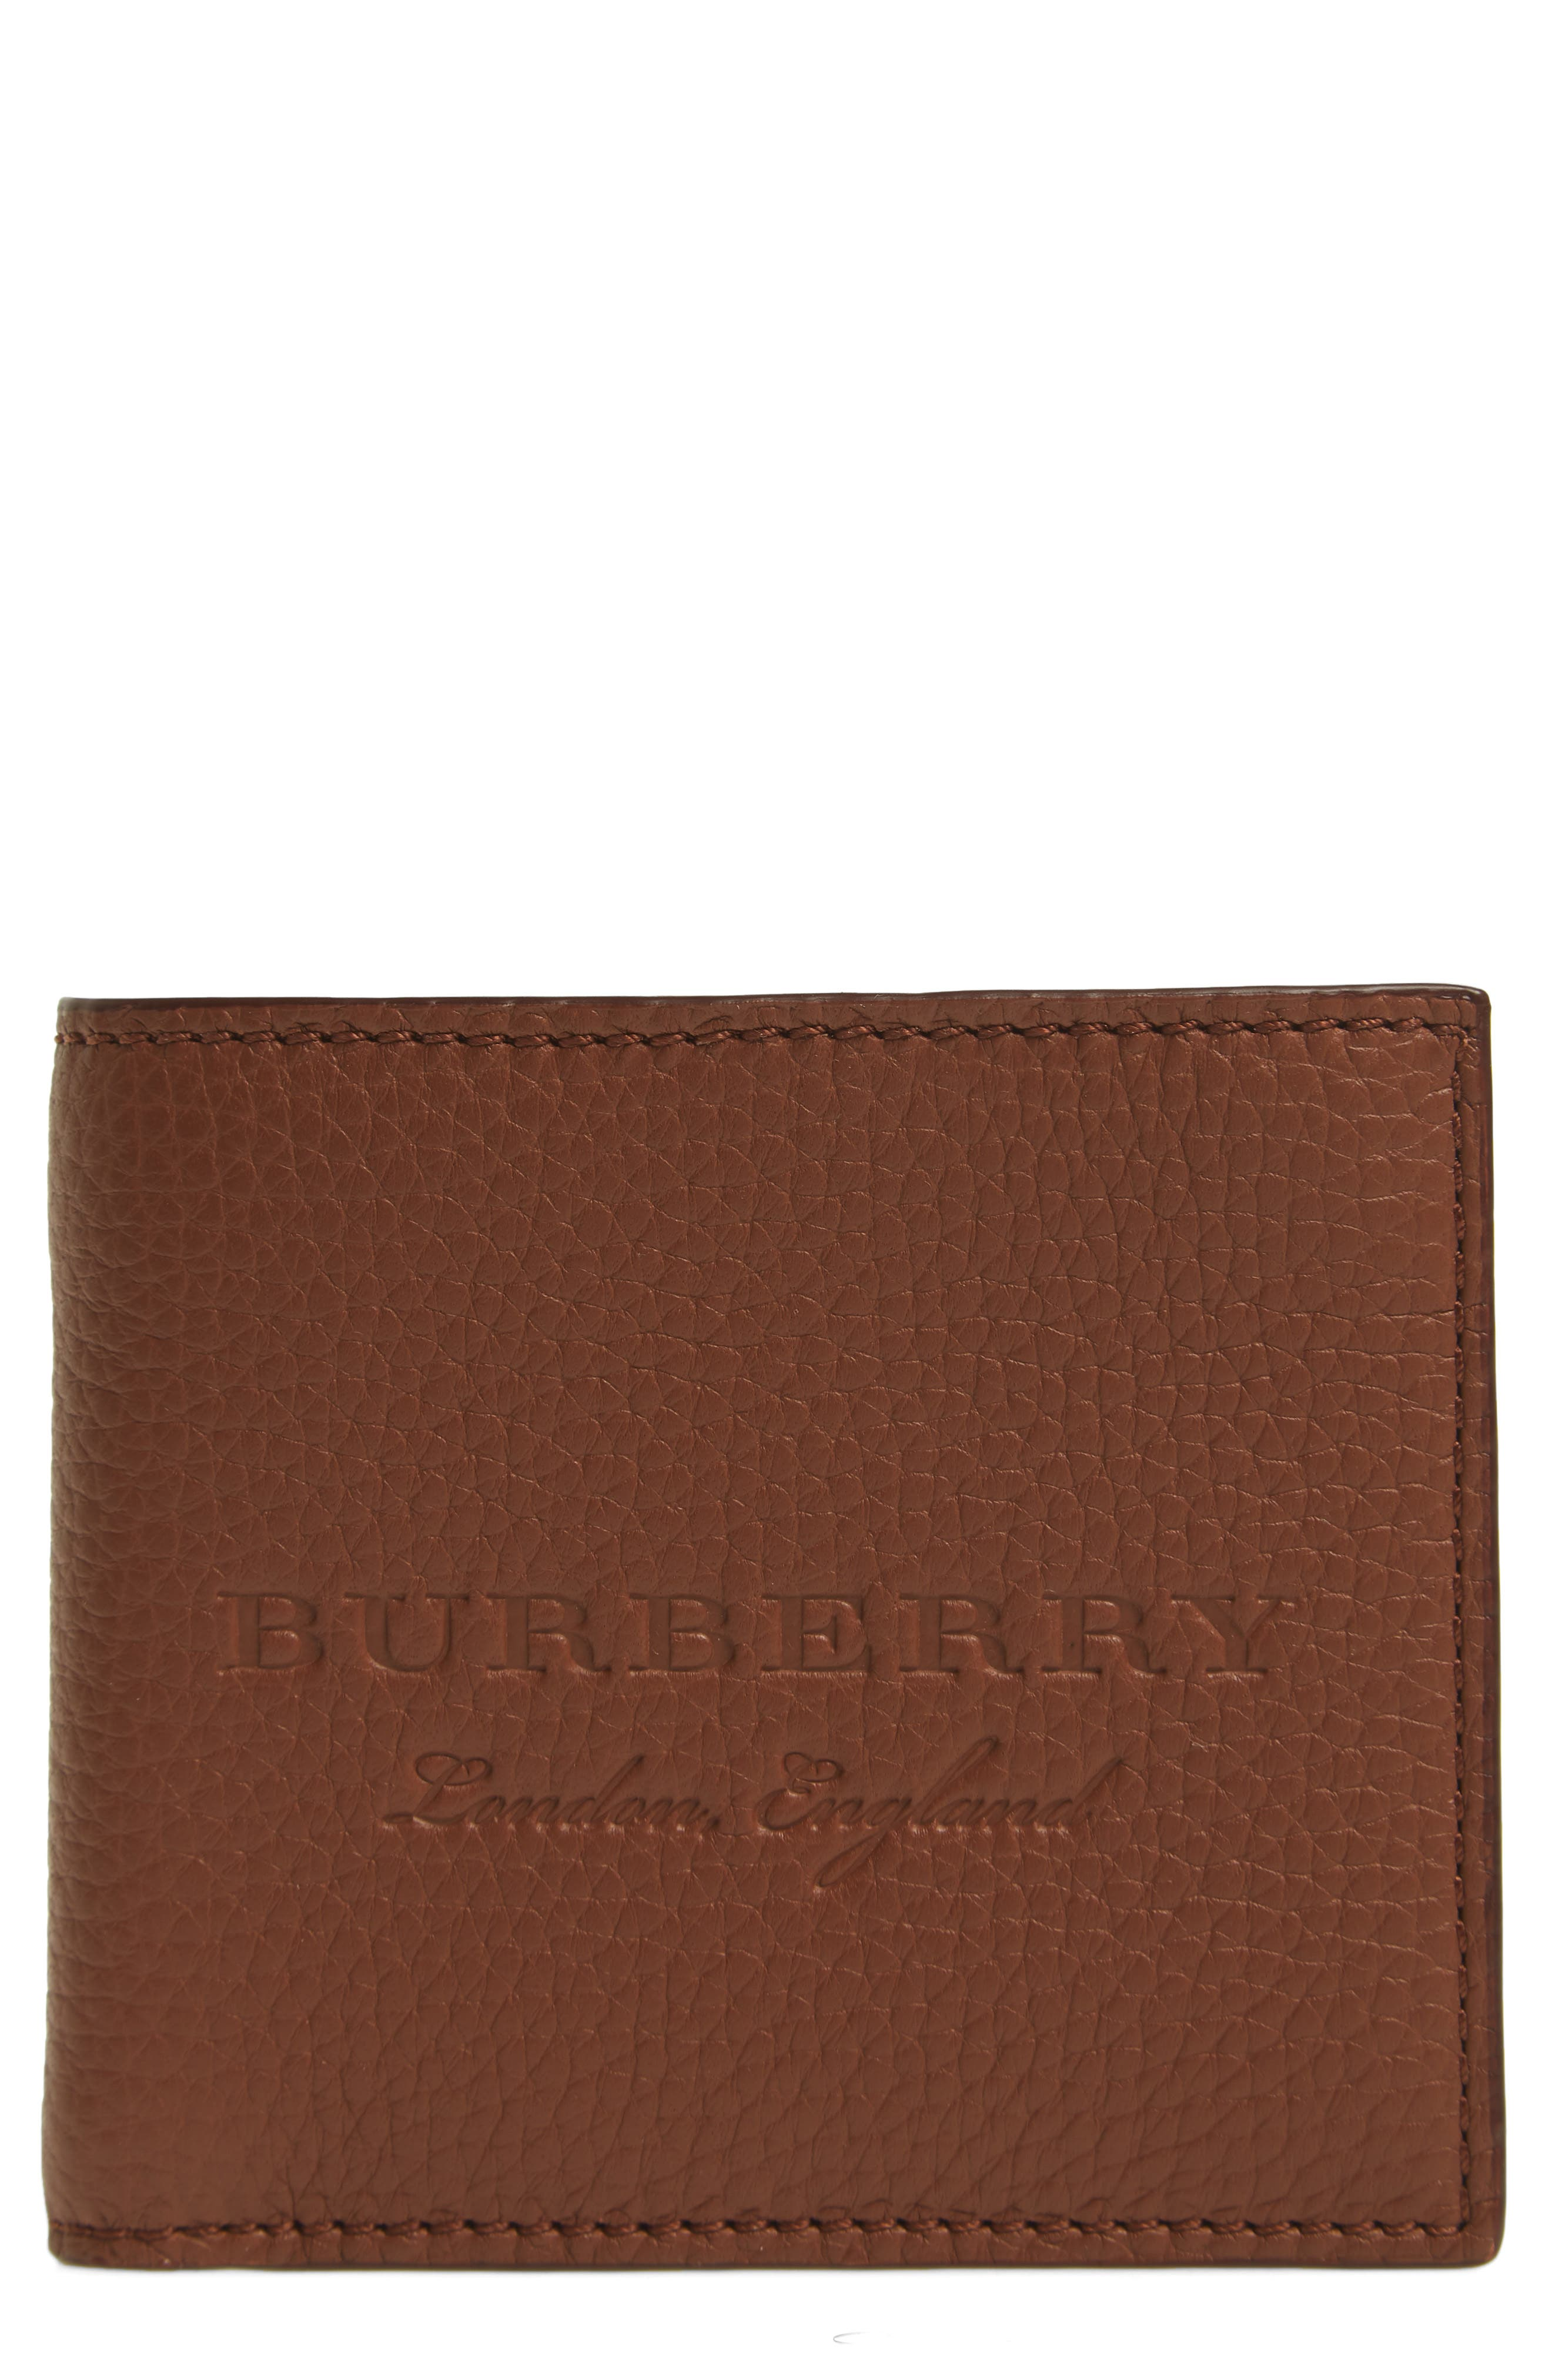 Billfold Wallet,                             Main thumbnail 1, color,                             Chestnut Brown